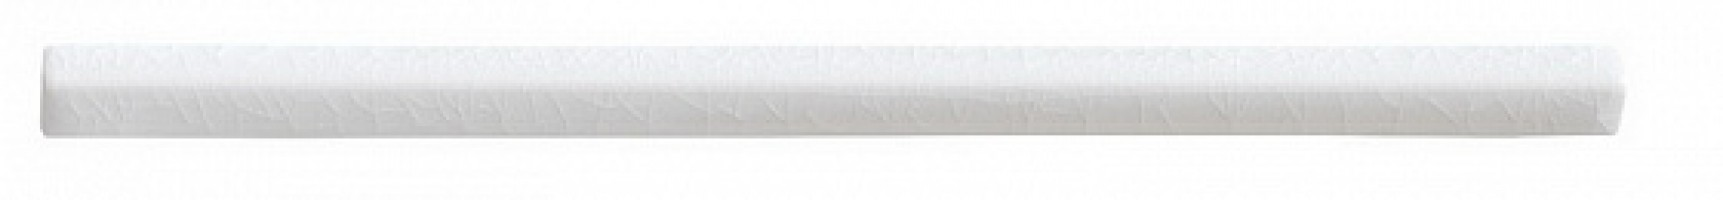 Бордюр Modernista ADMO5422 Bullnose Trim C/C Marfil 0.85x15 Adex